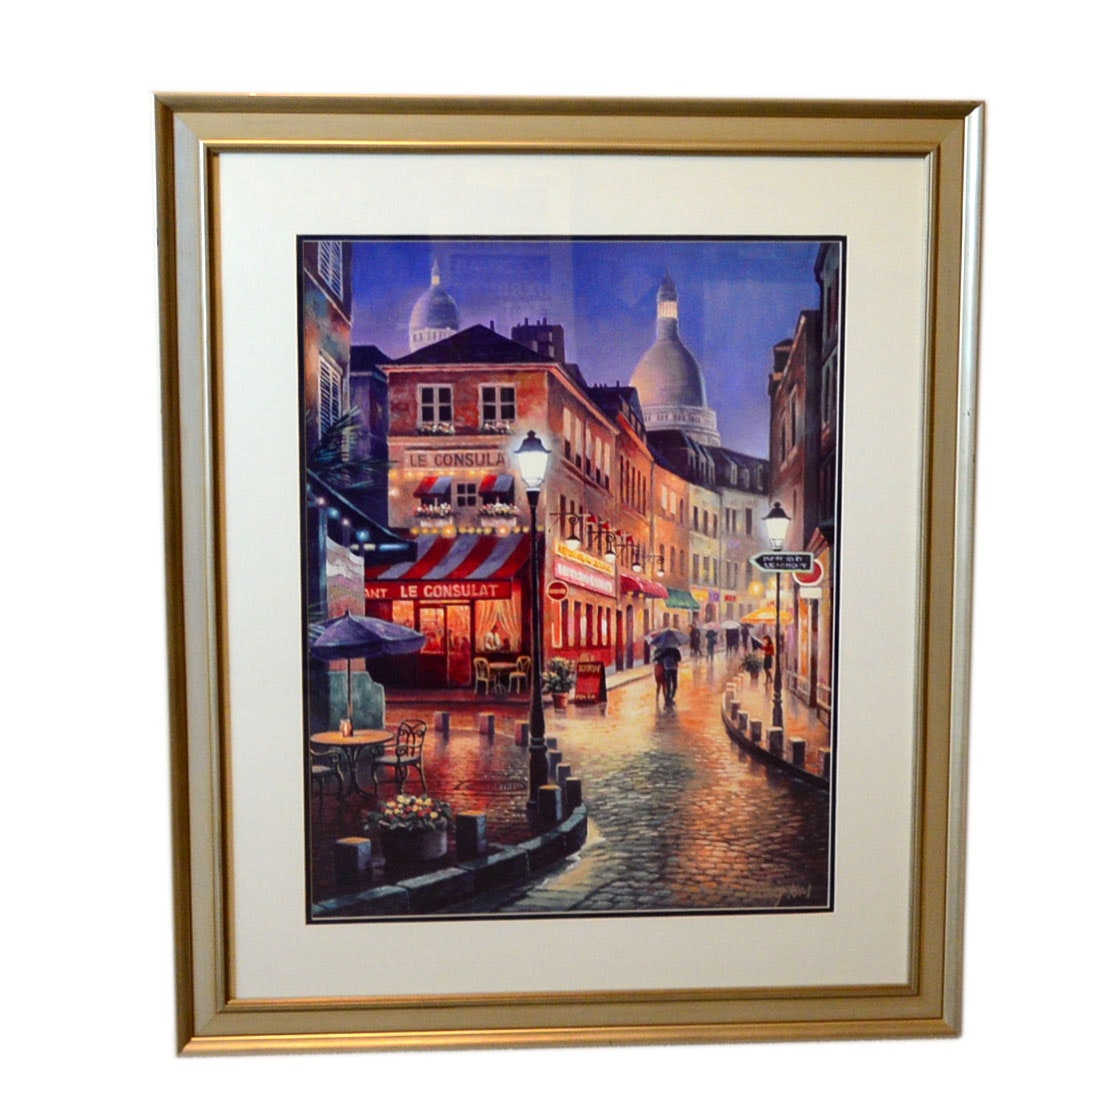 Framed Offset Lithograph Depicting A Street Scene